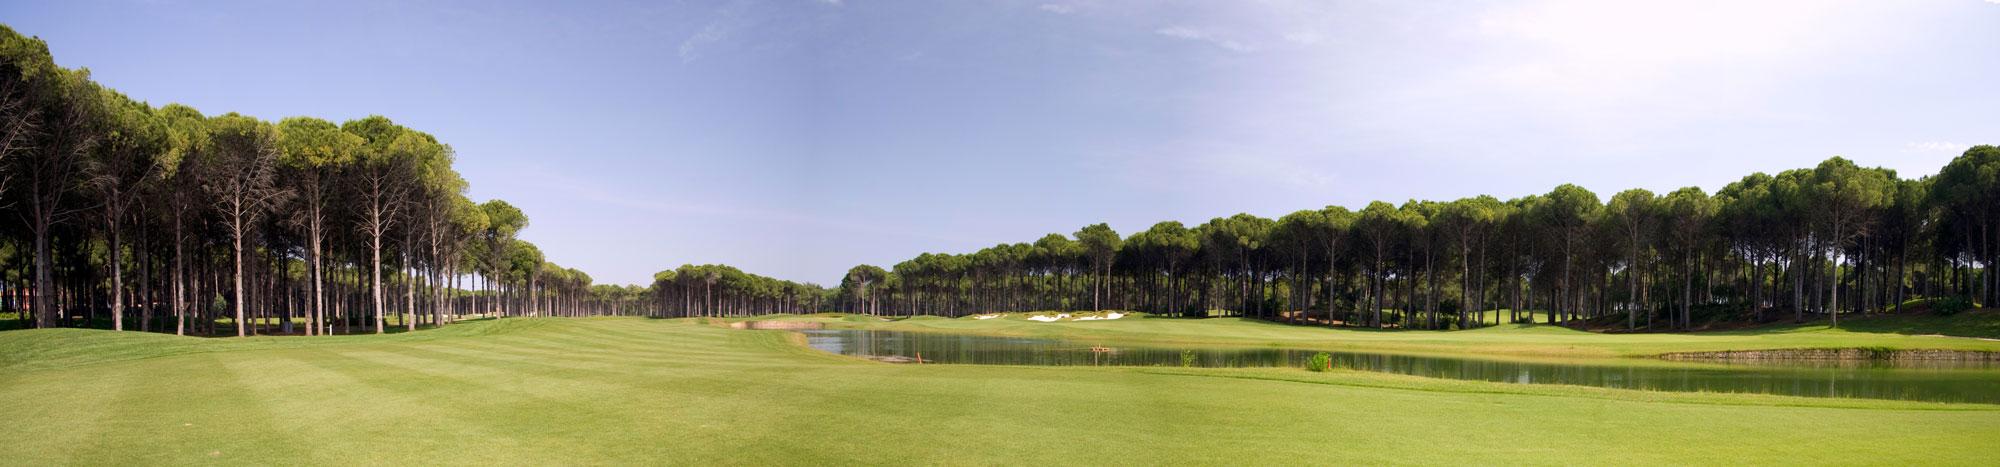 SwitchGrips SA - Golf Course